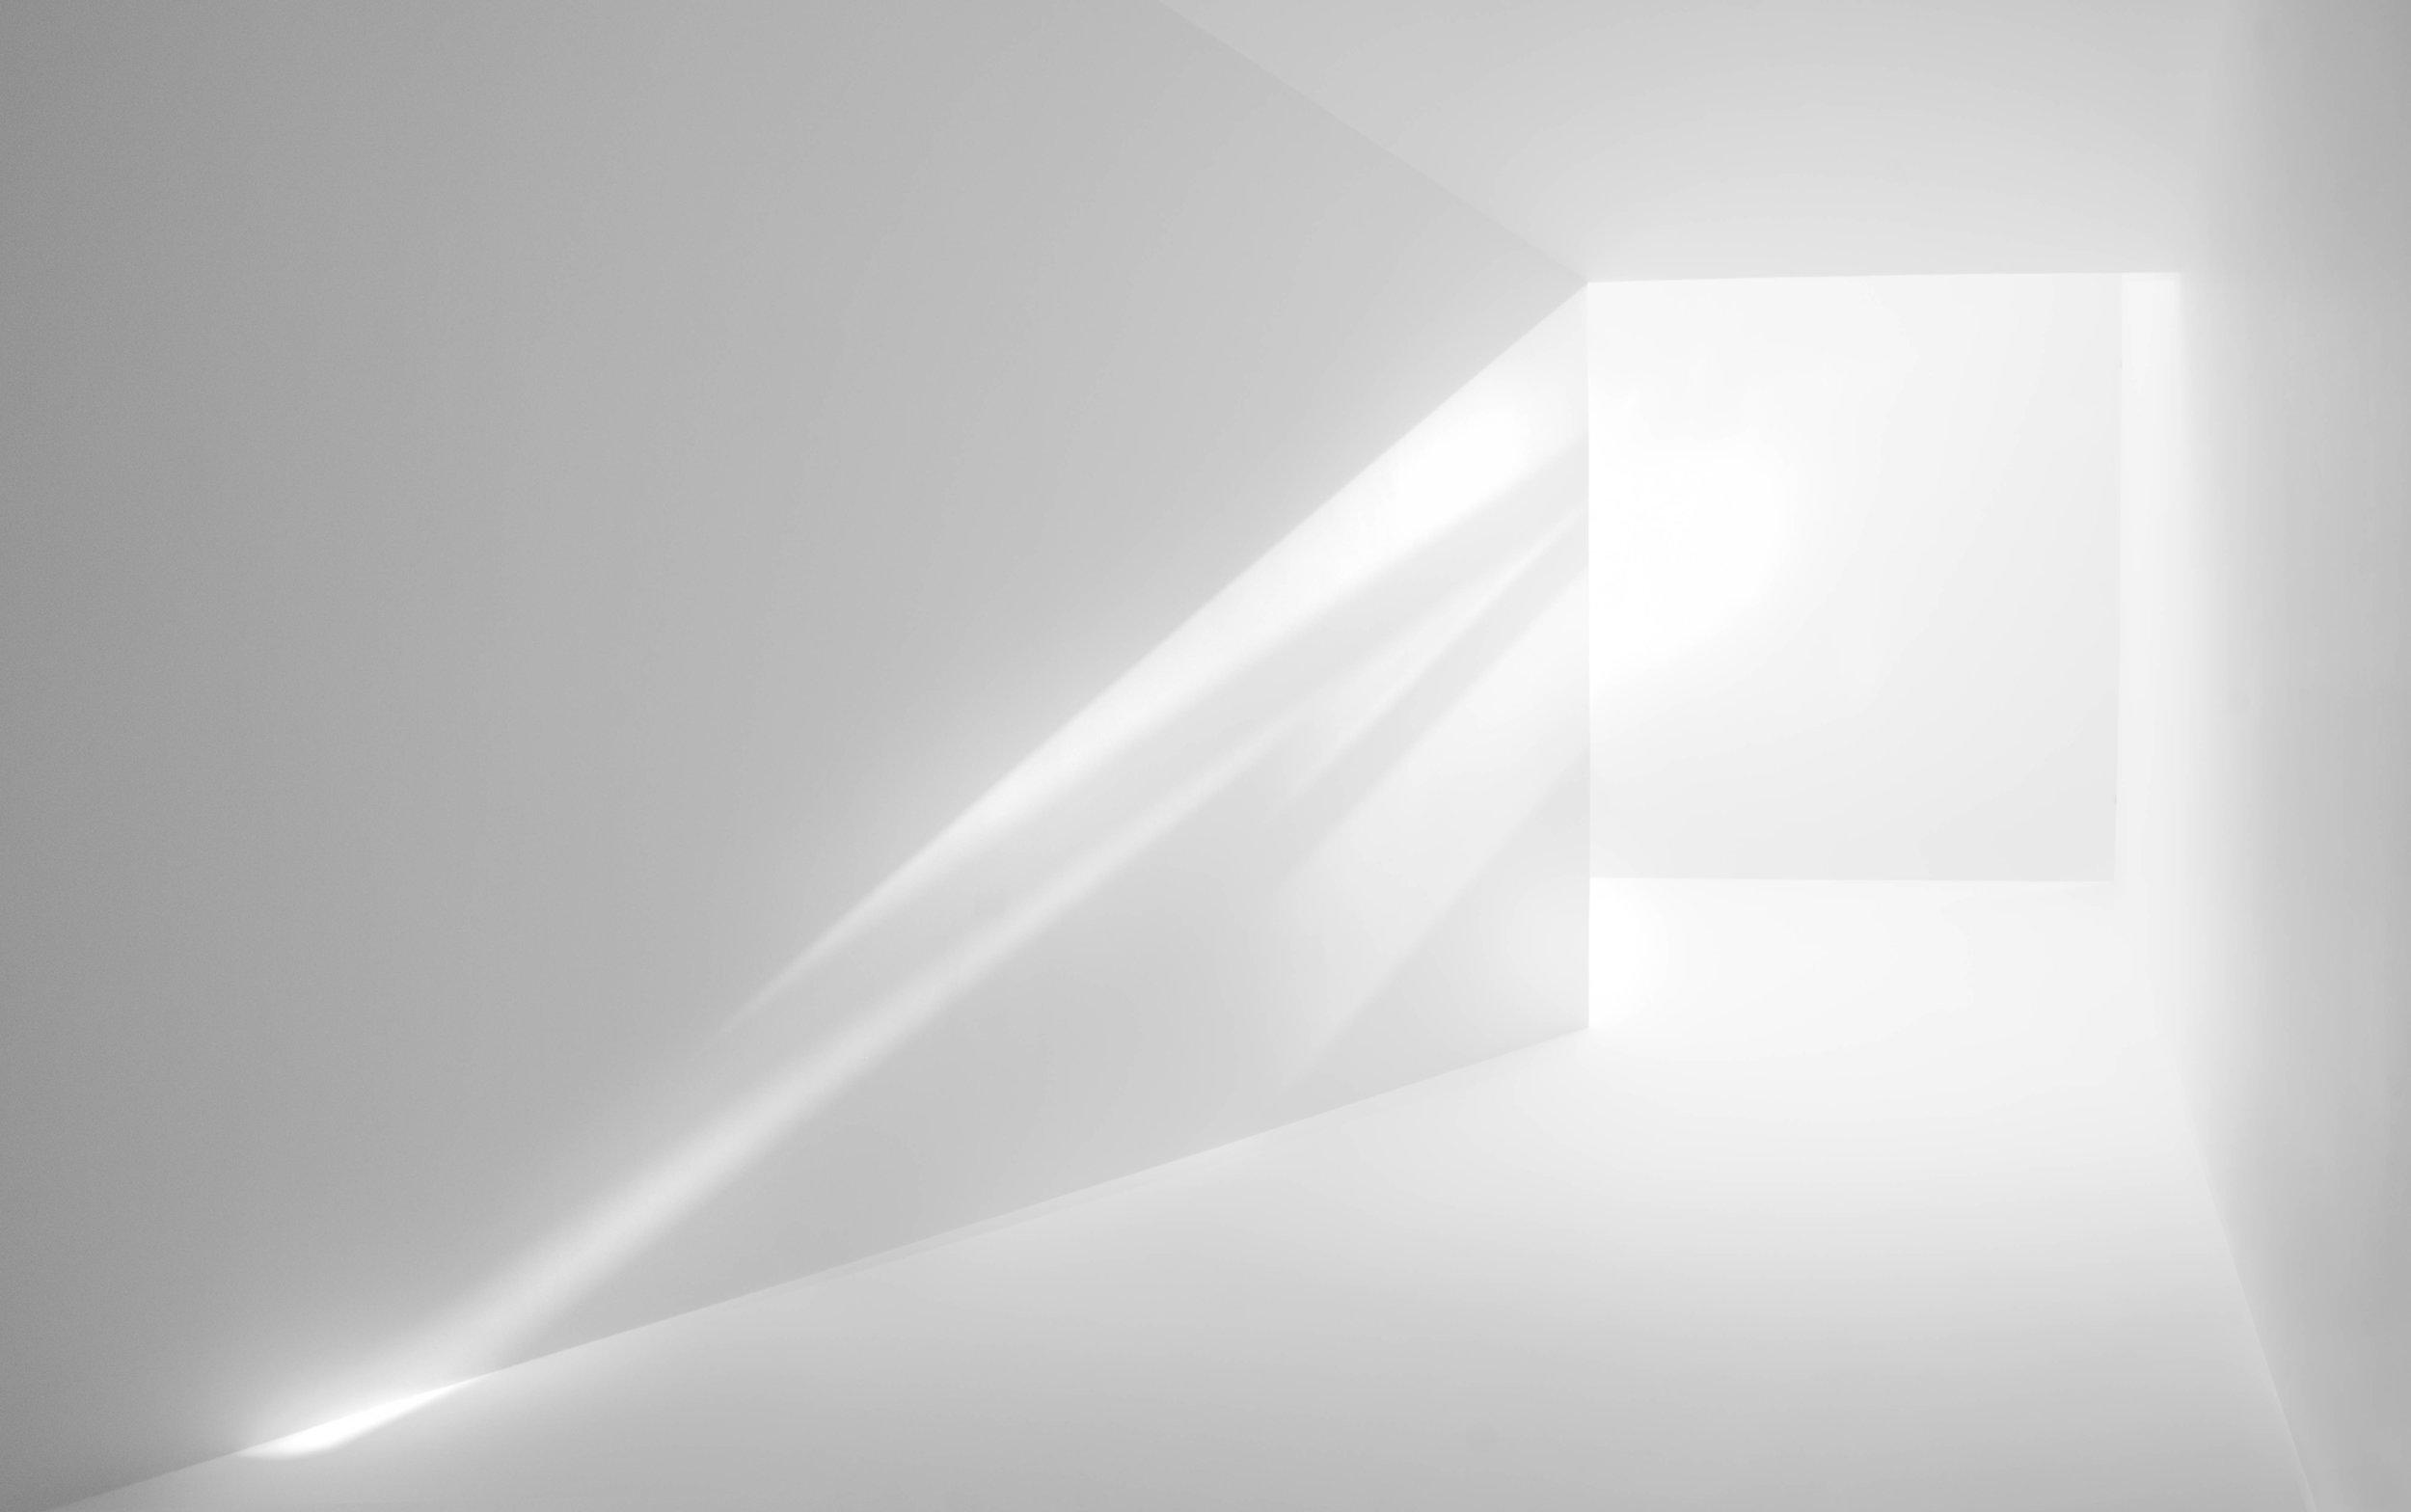 DSC_3123-Edit_tif.jpg